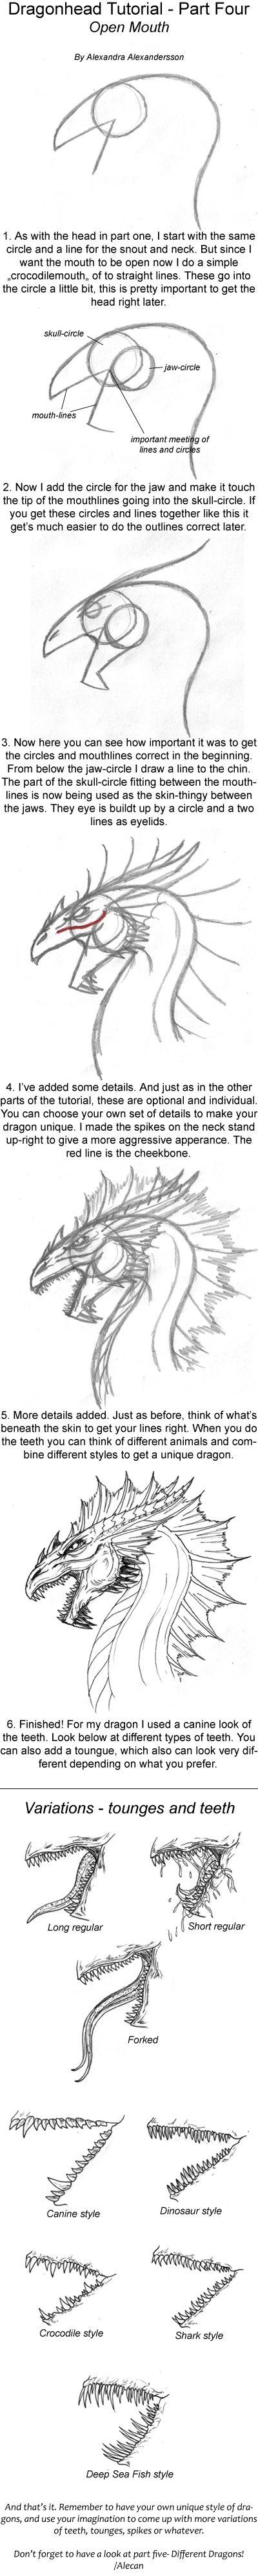 Dragonhead Tutorial part four by alecan on DeviantArt